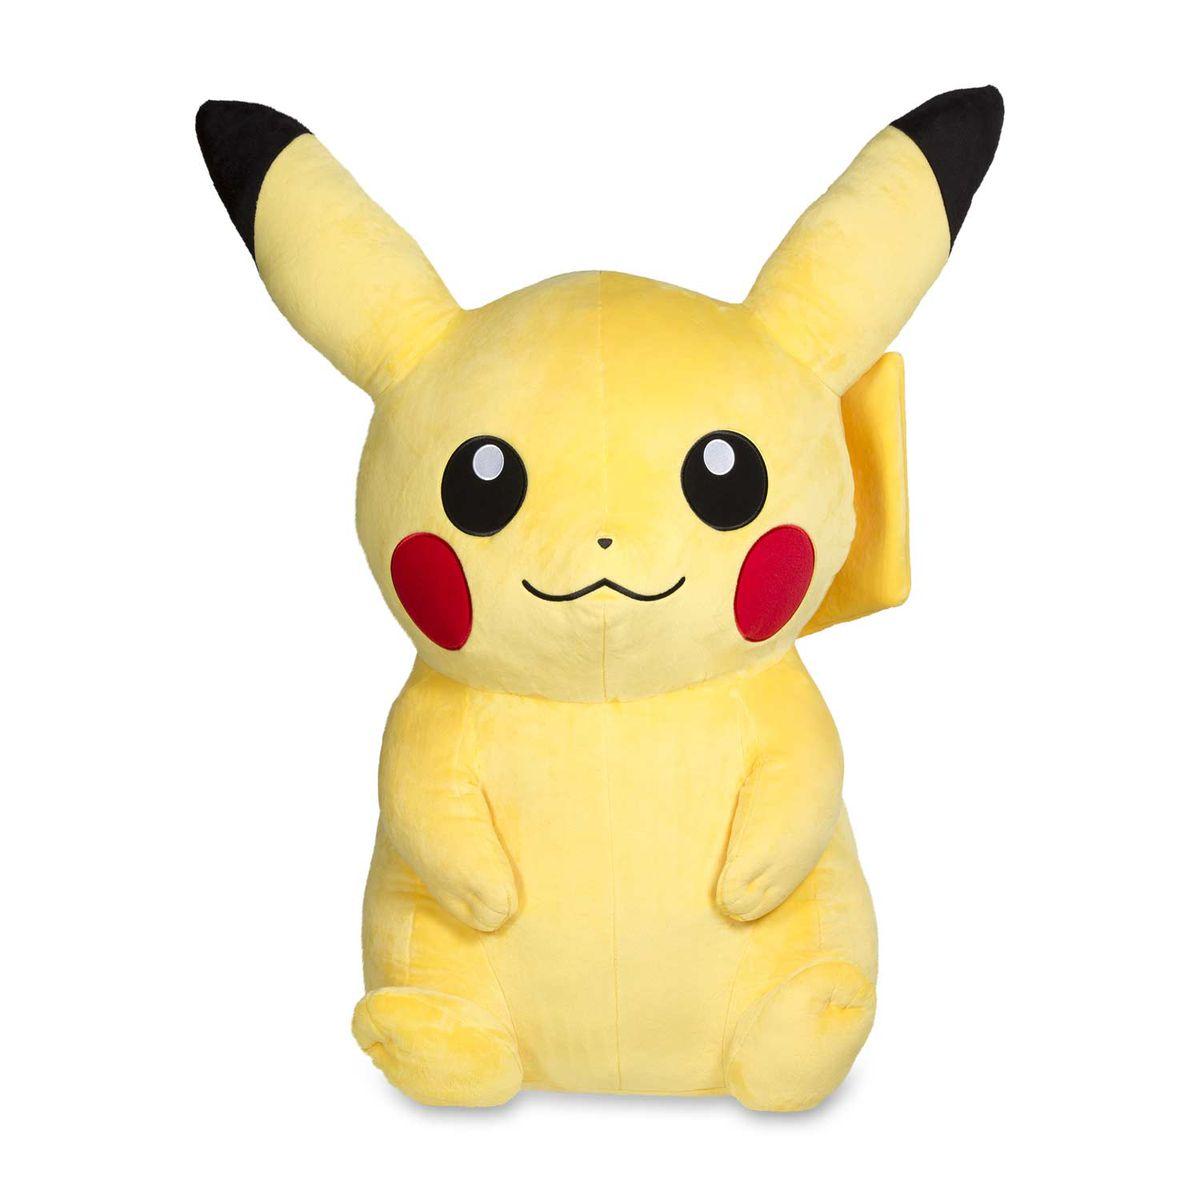 Jumbo Pikachu Pokémon plush